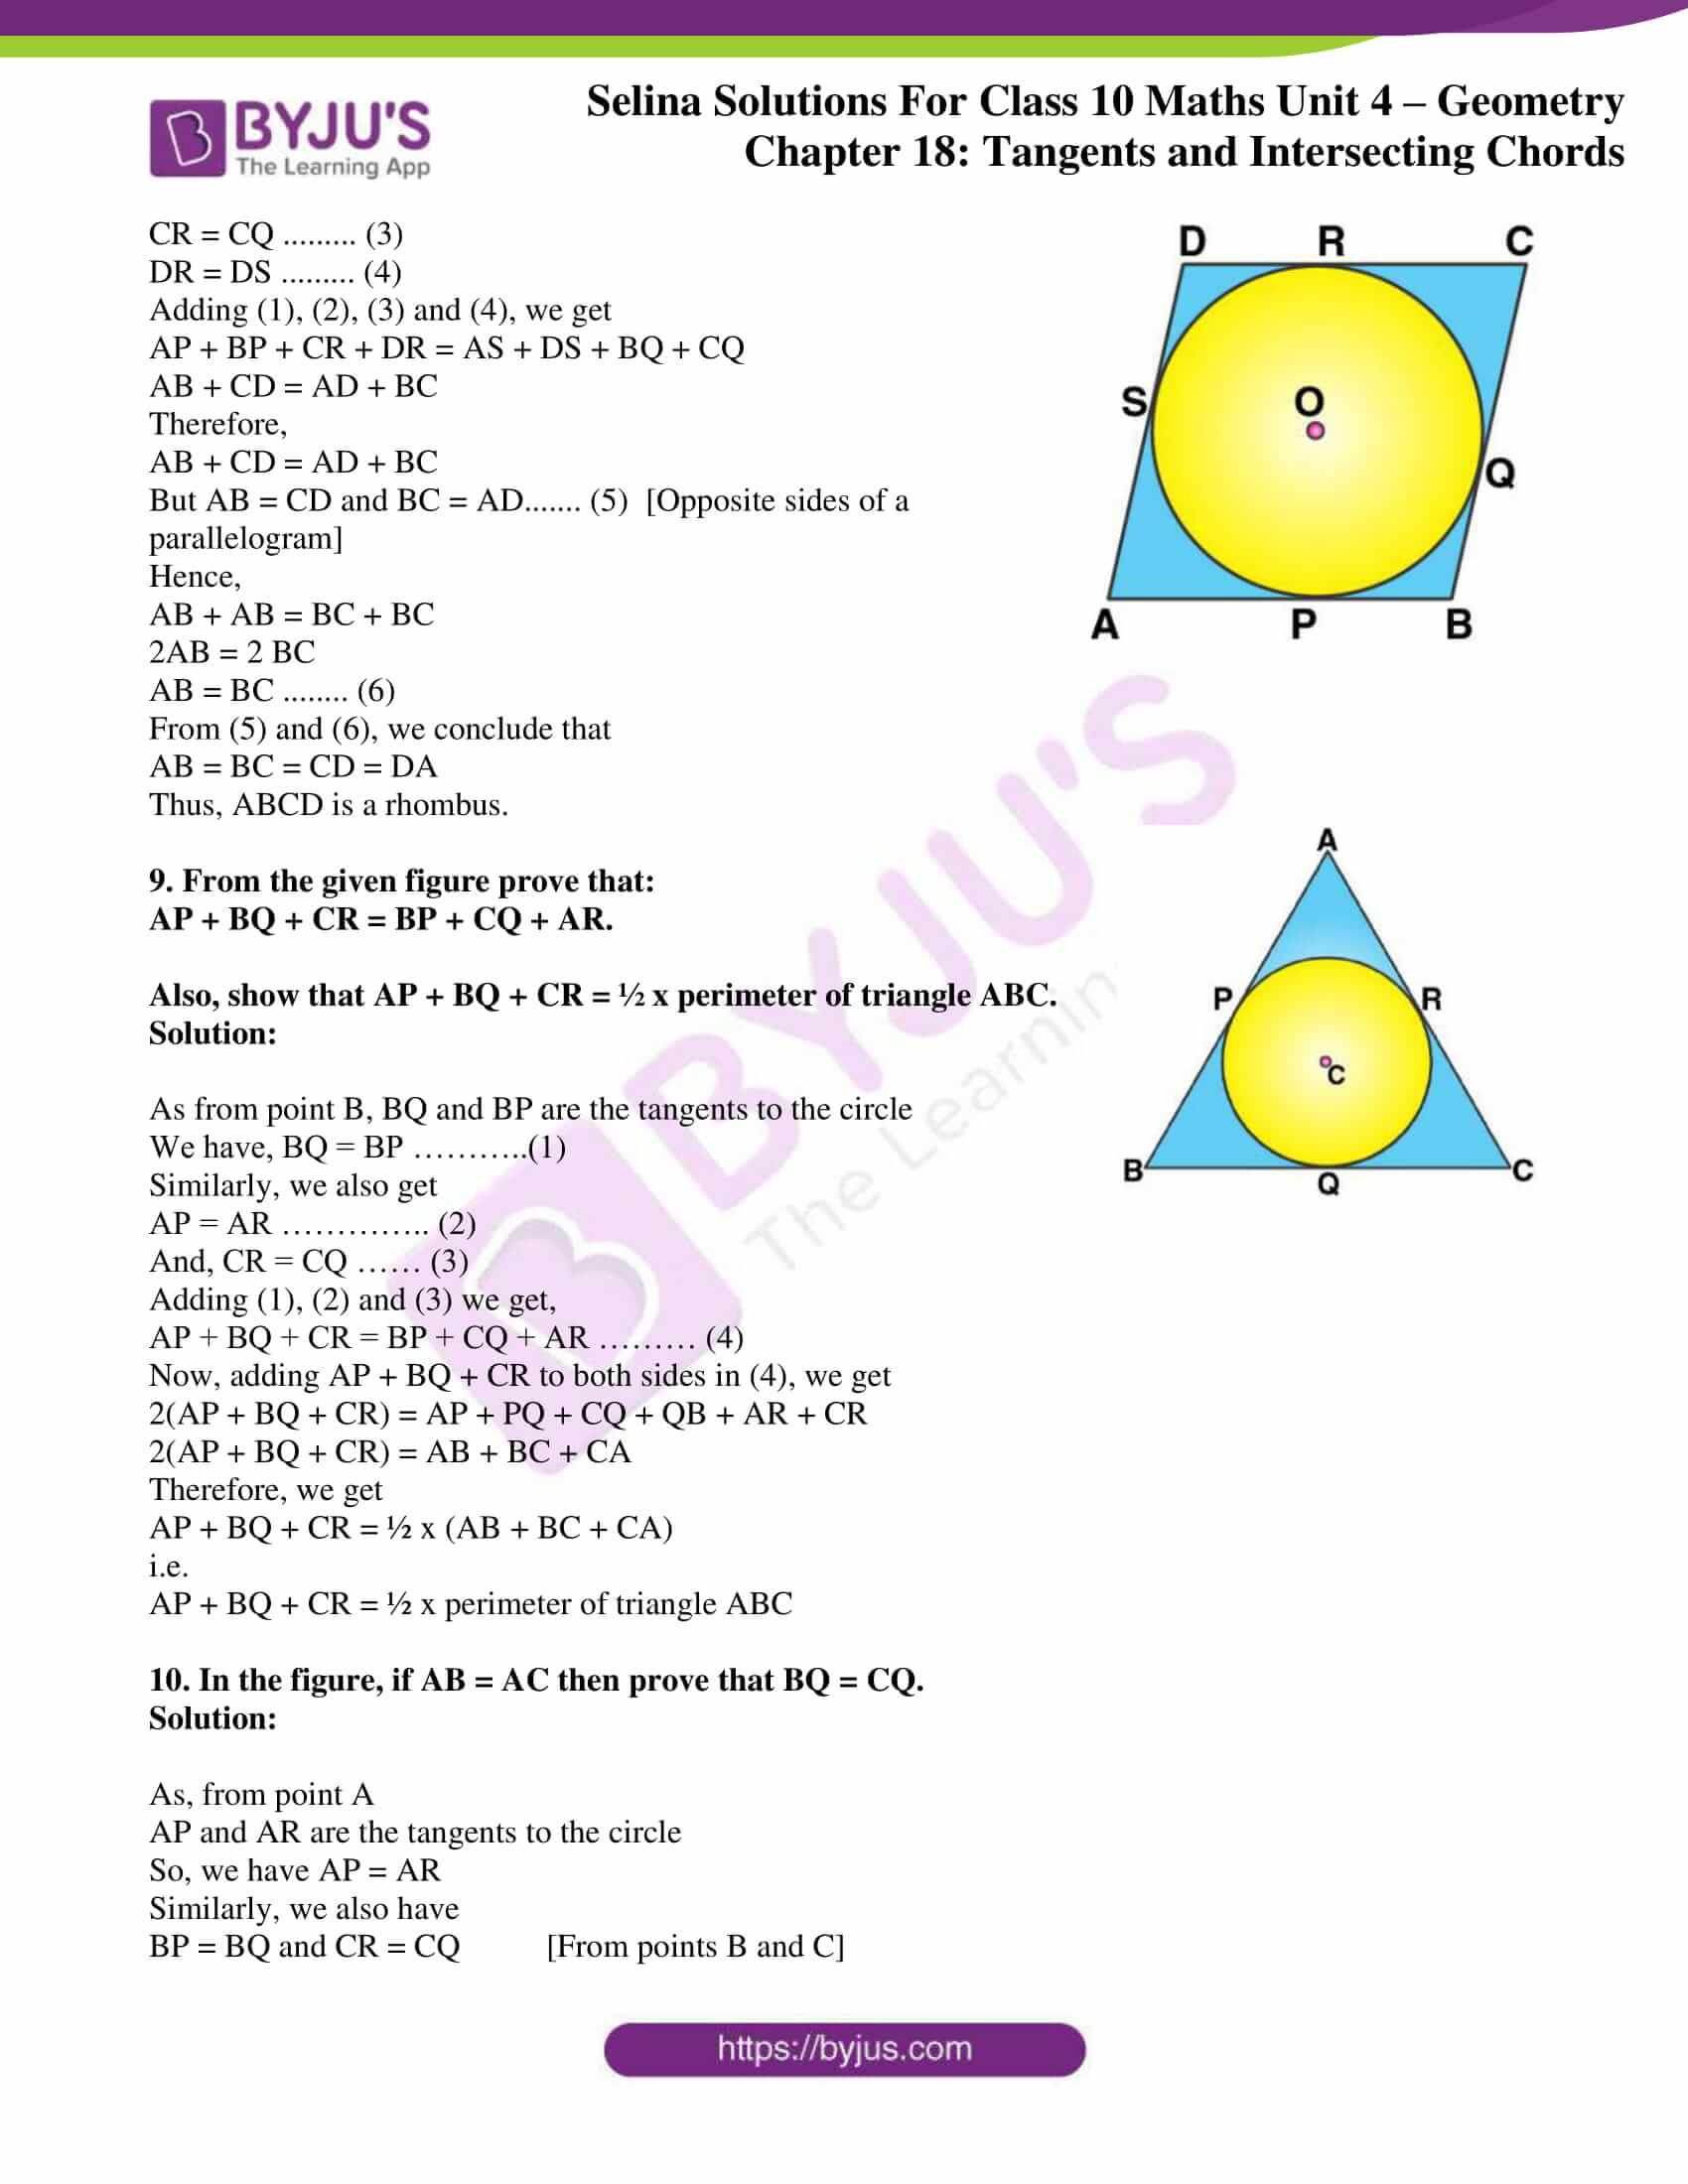 selina-sol-maths-class-10-ch-18-ex-a-5